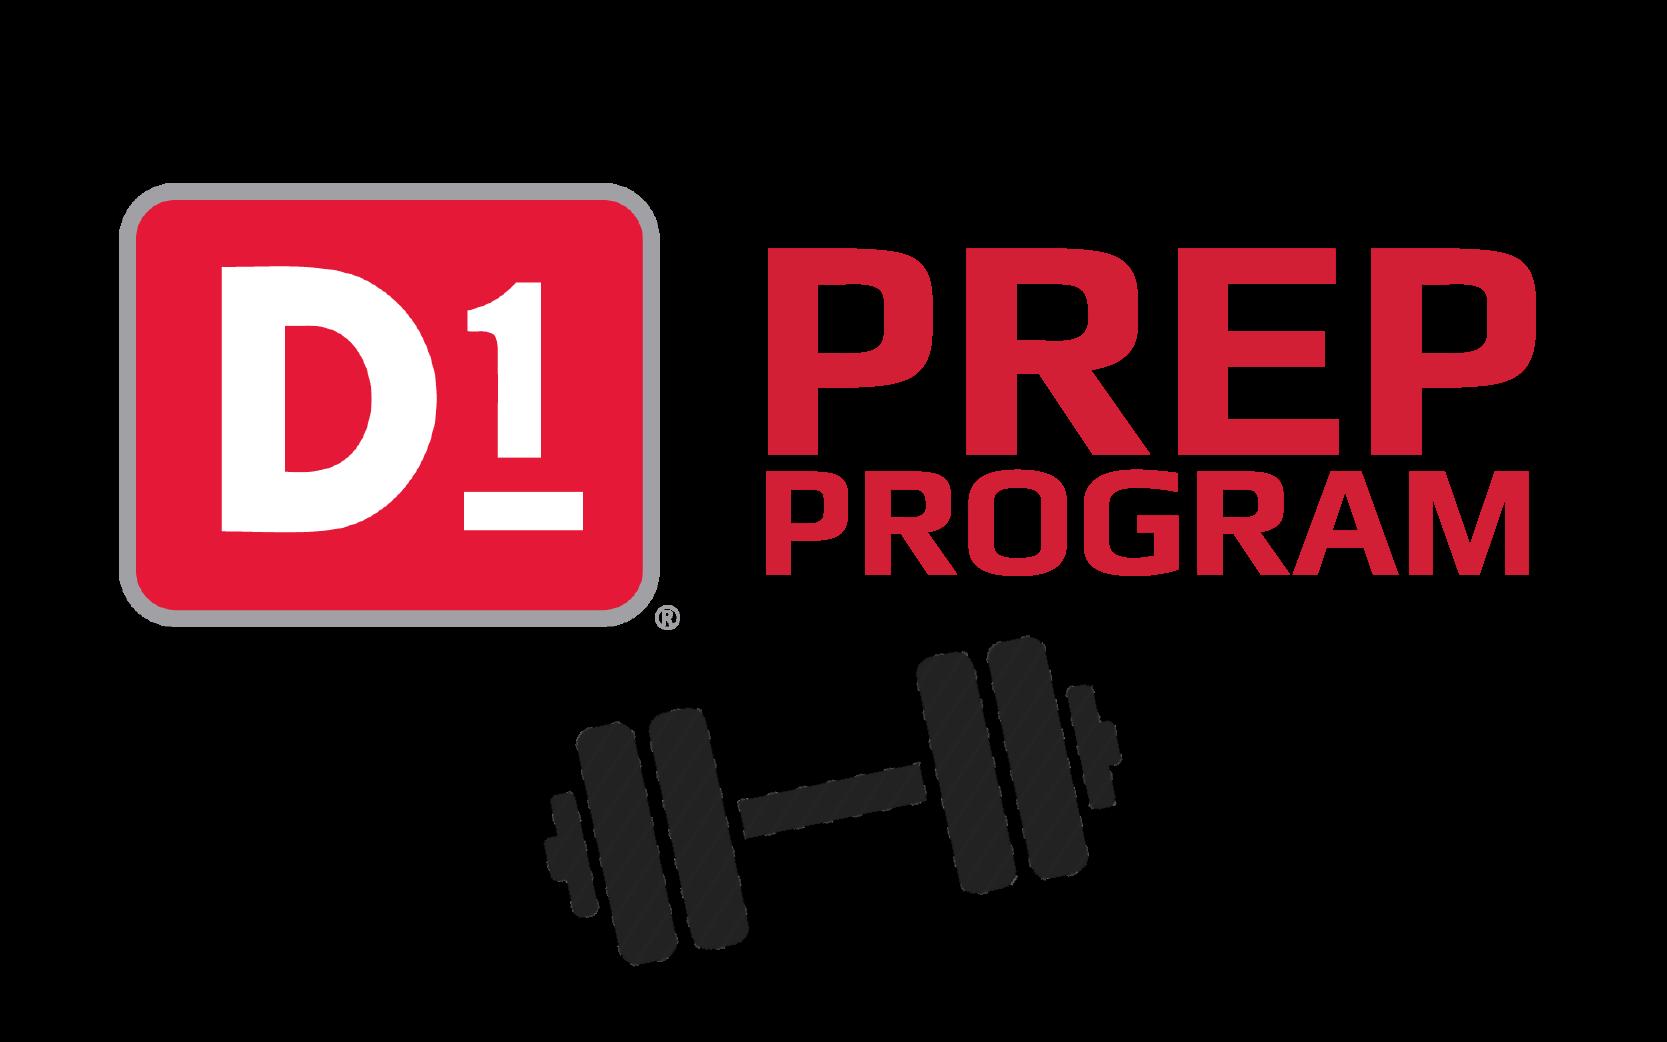 D1 Prep Program